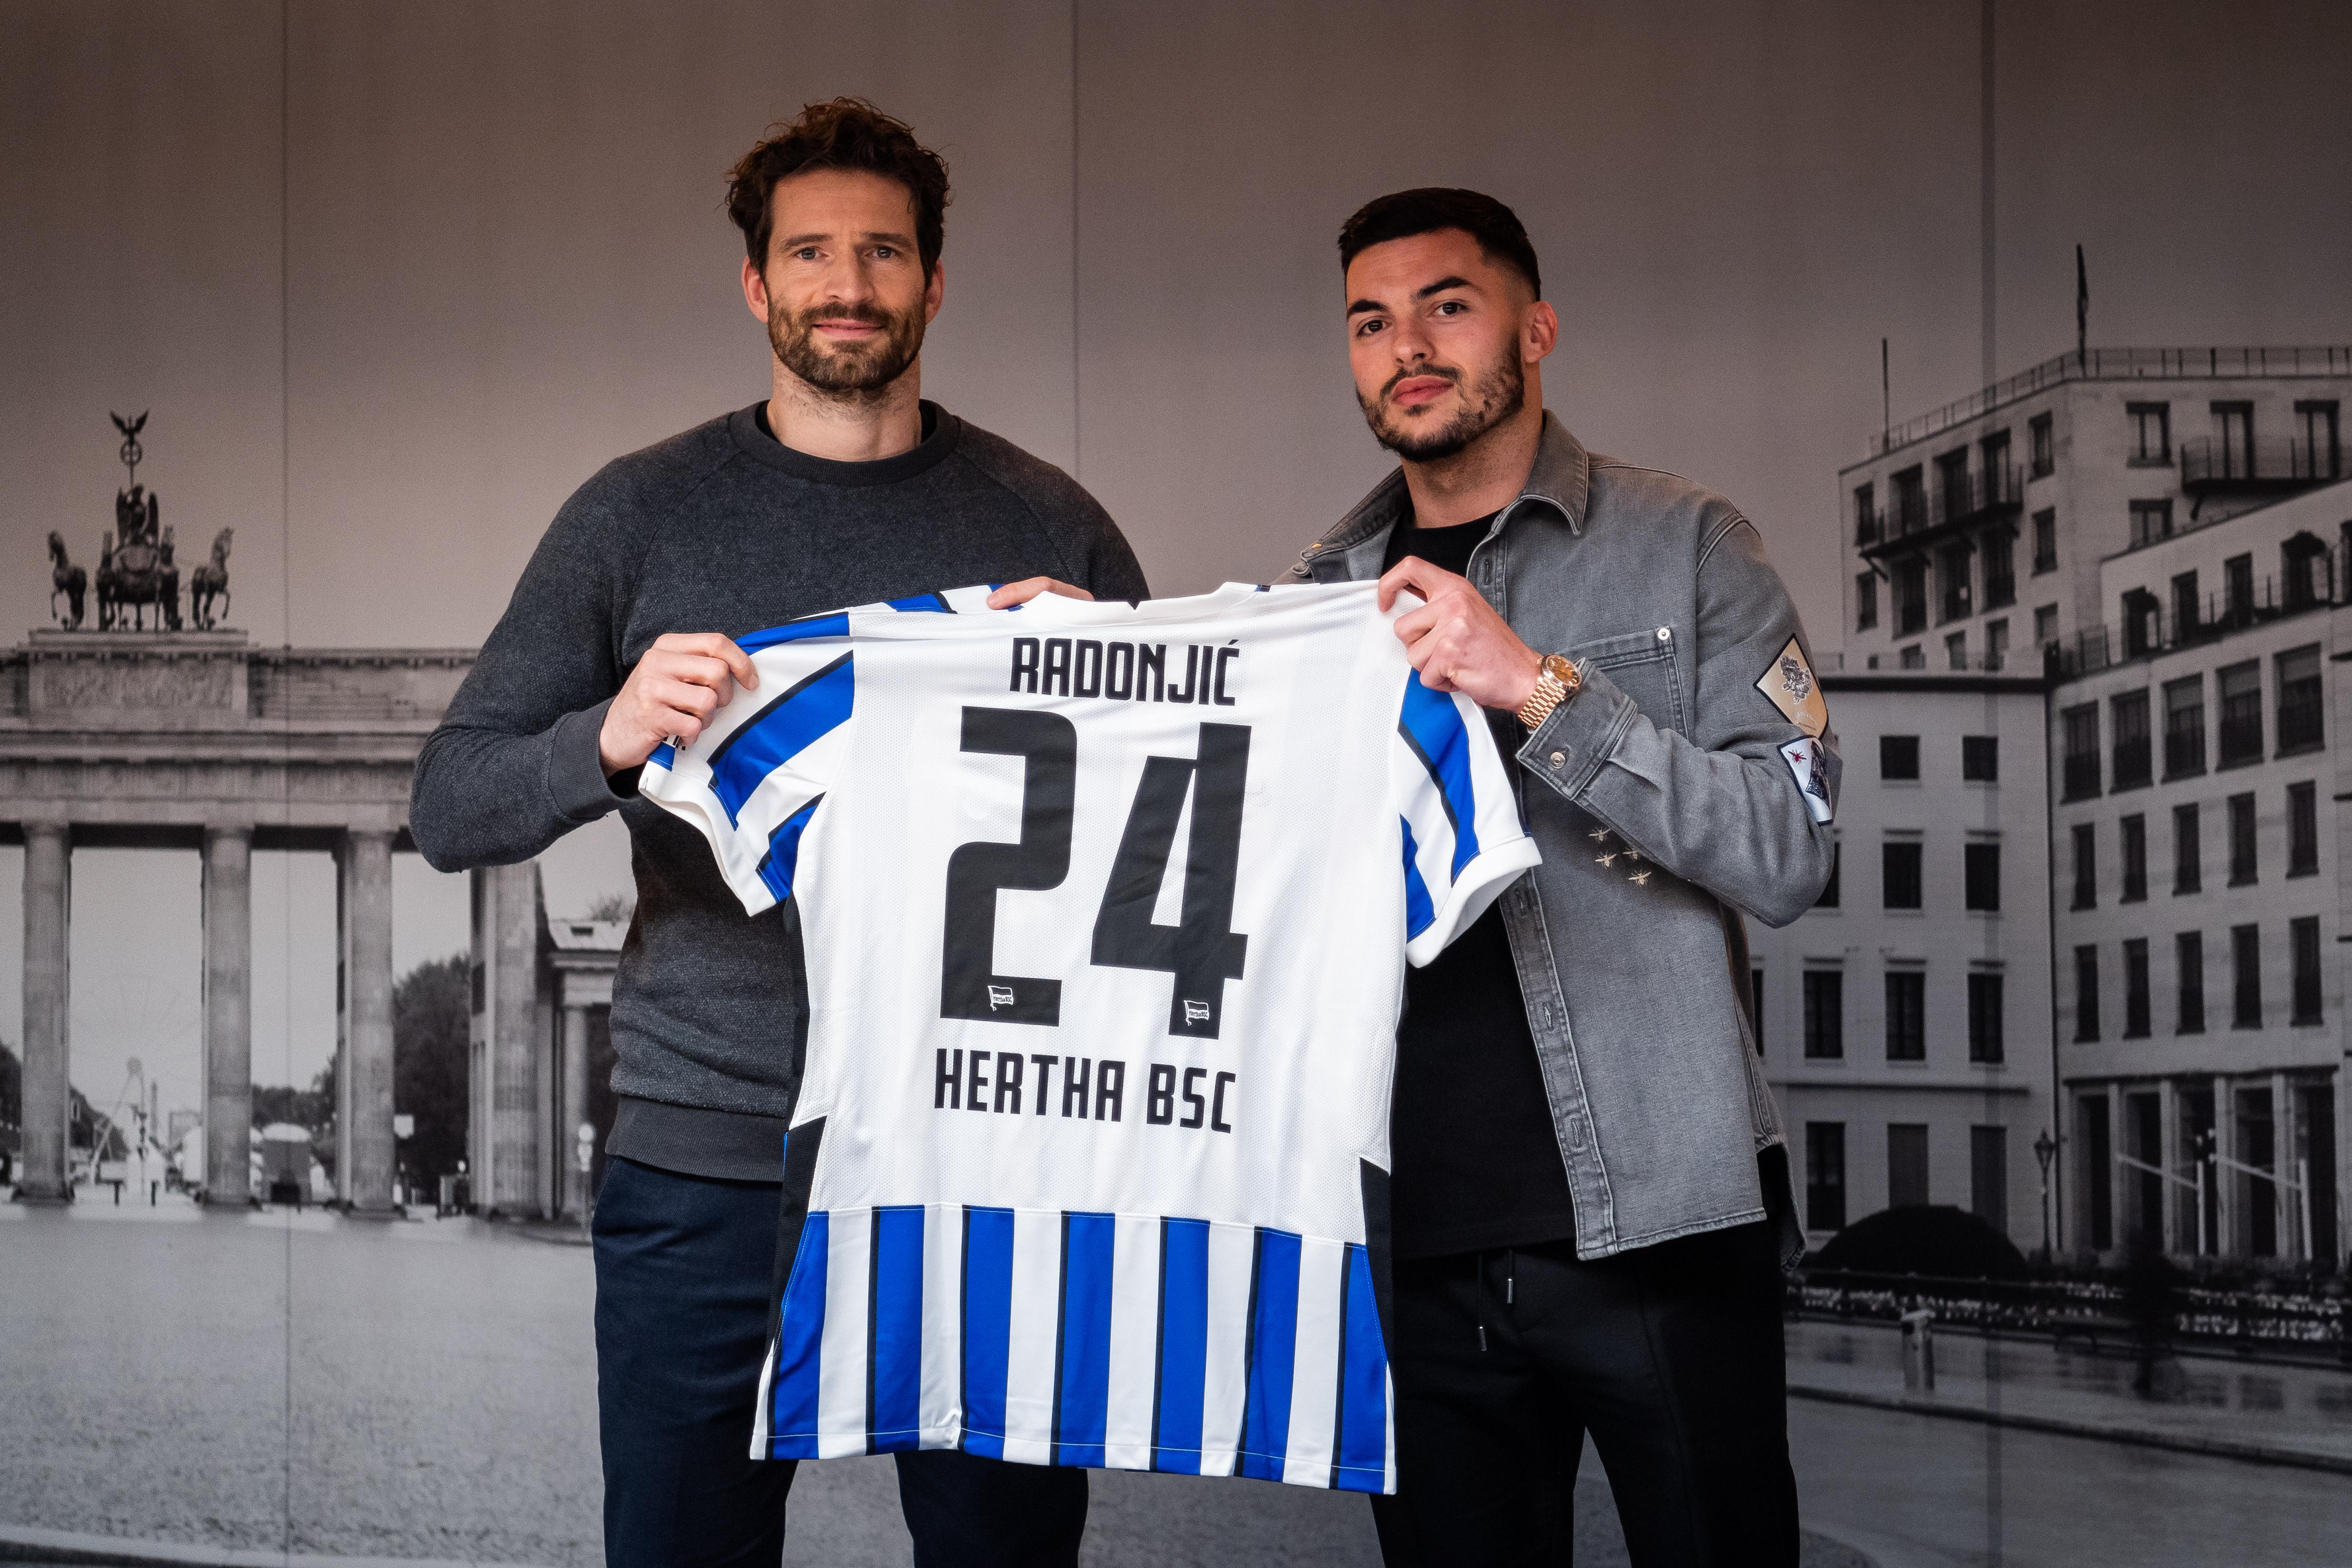 Hertha BSC leiht Nemanja Radonjić aus